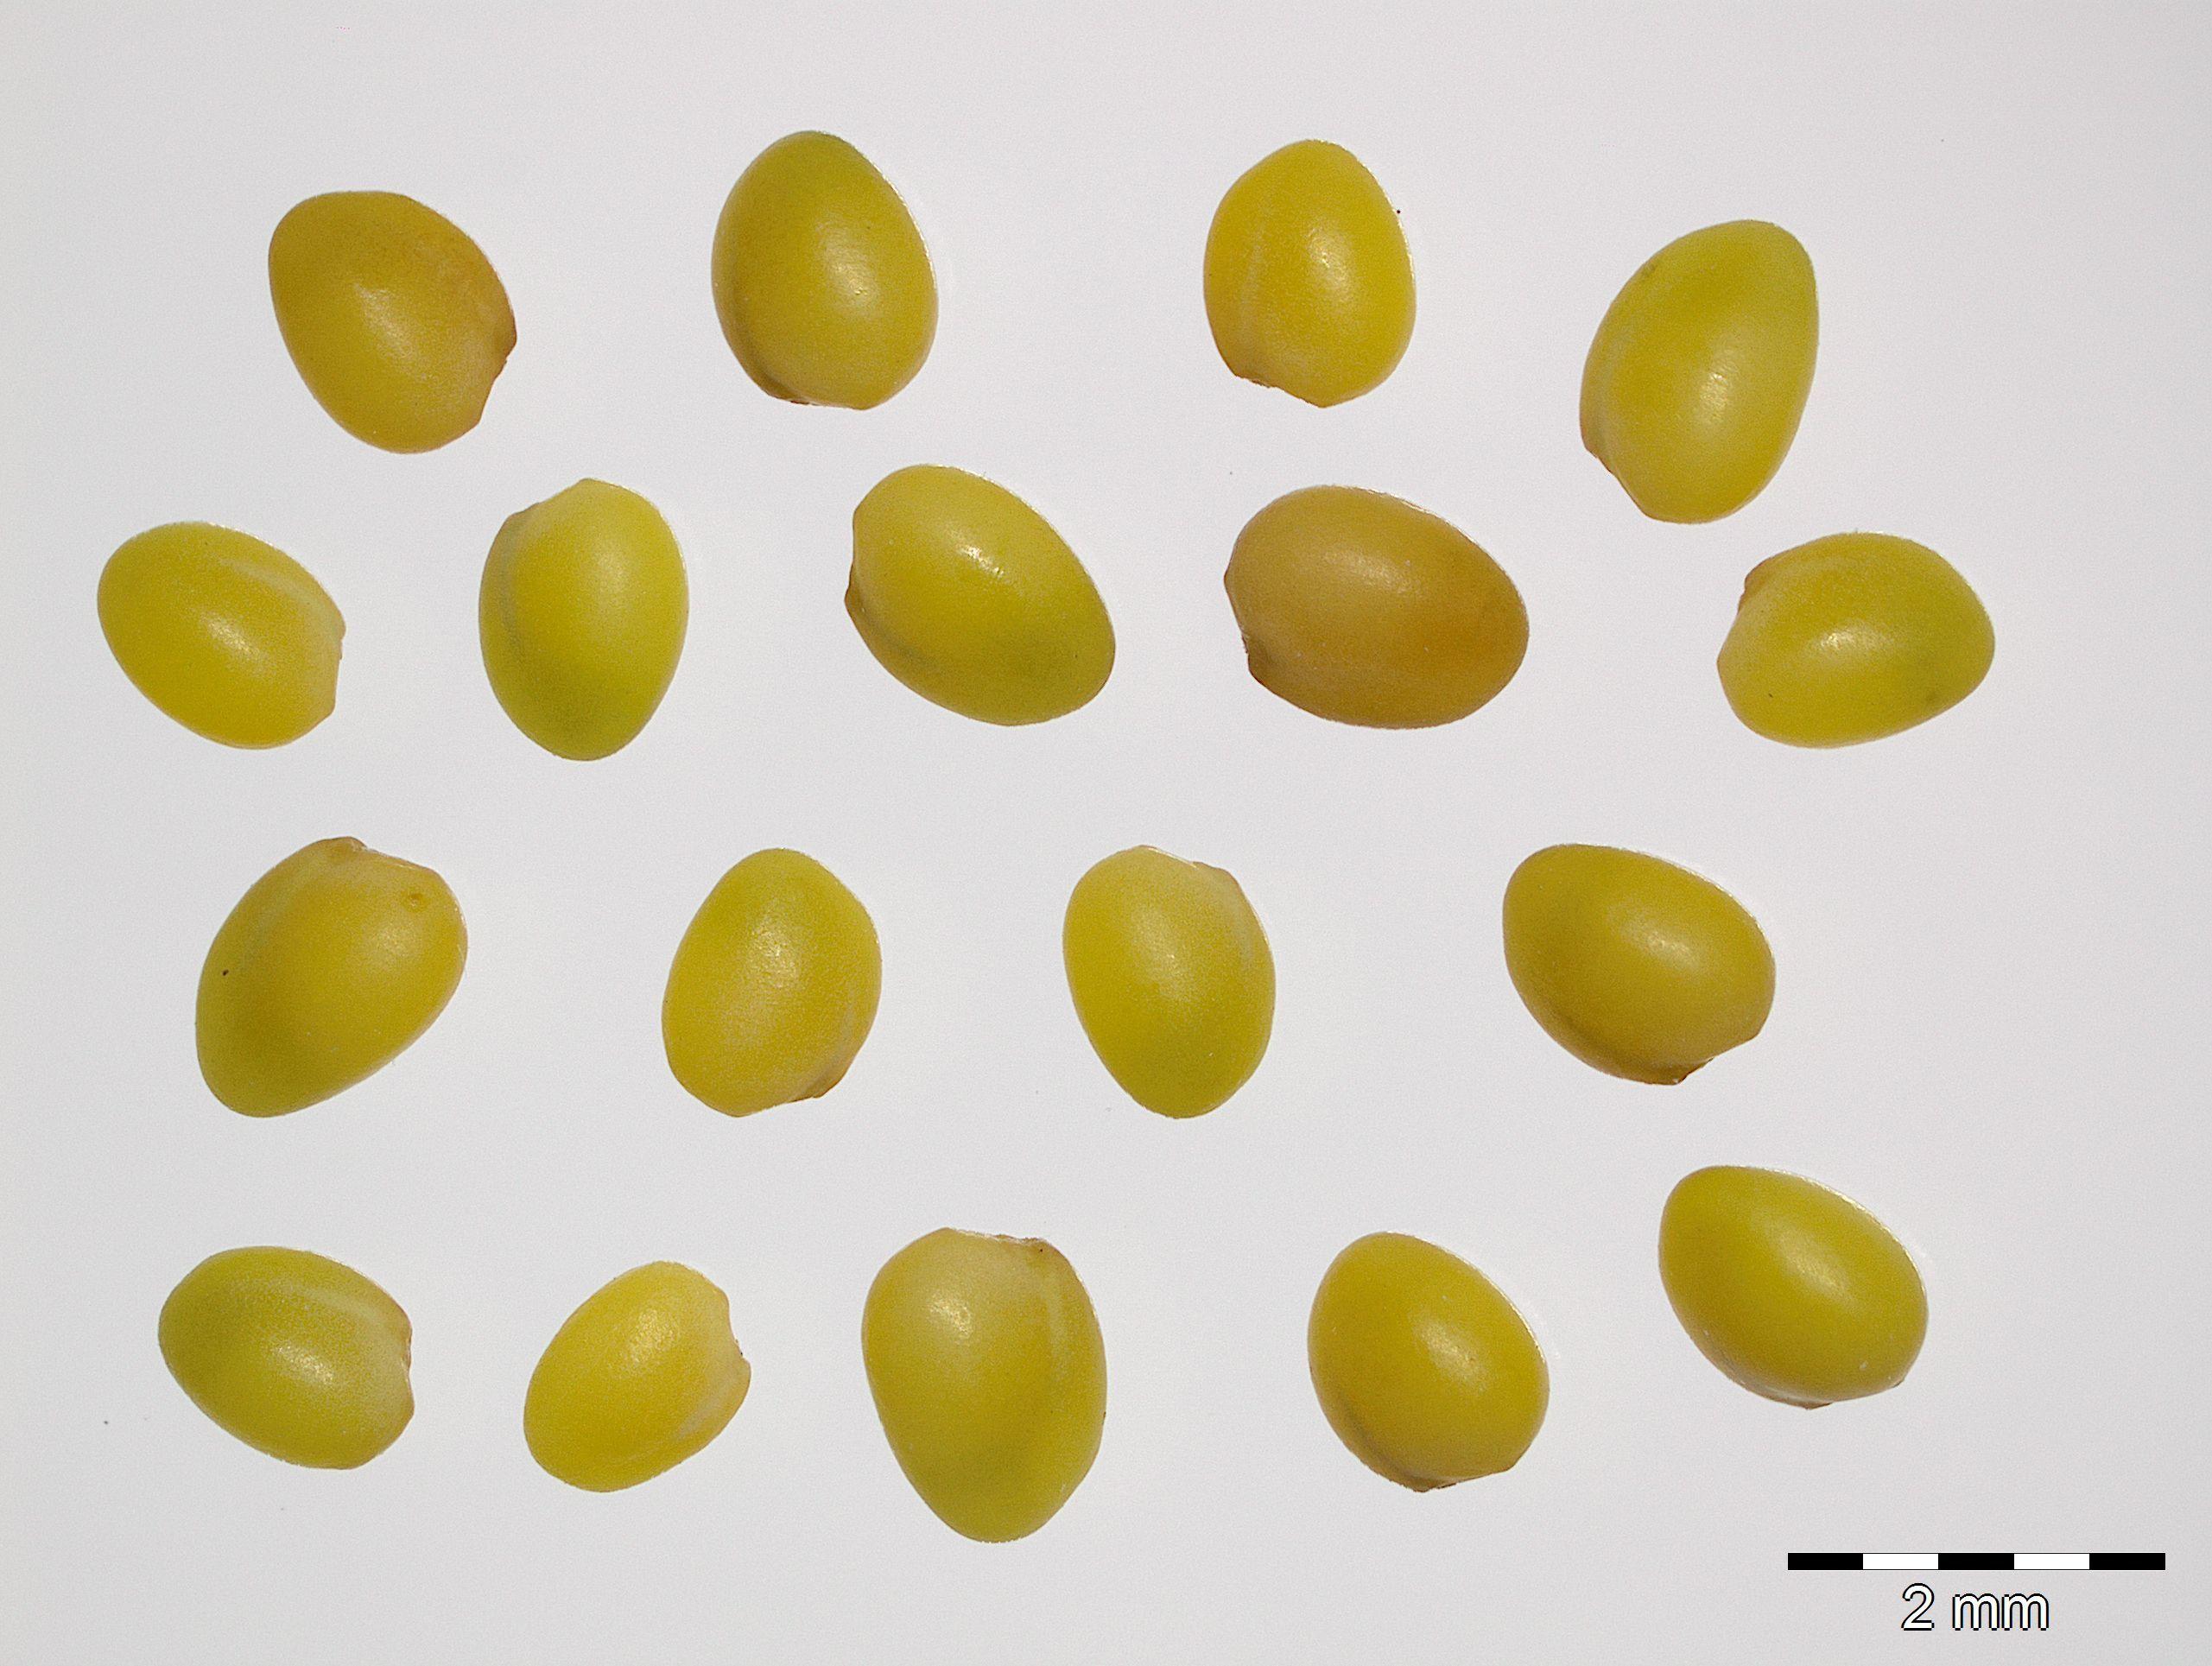 https://pictures.bgbm.org/digilib/Scaler?fn=Cyprus/Trifolium_boissieri_C2.jpg&mo=file